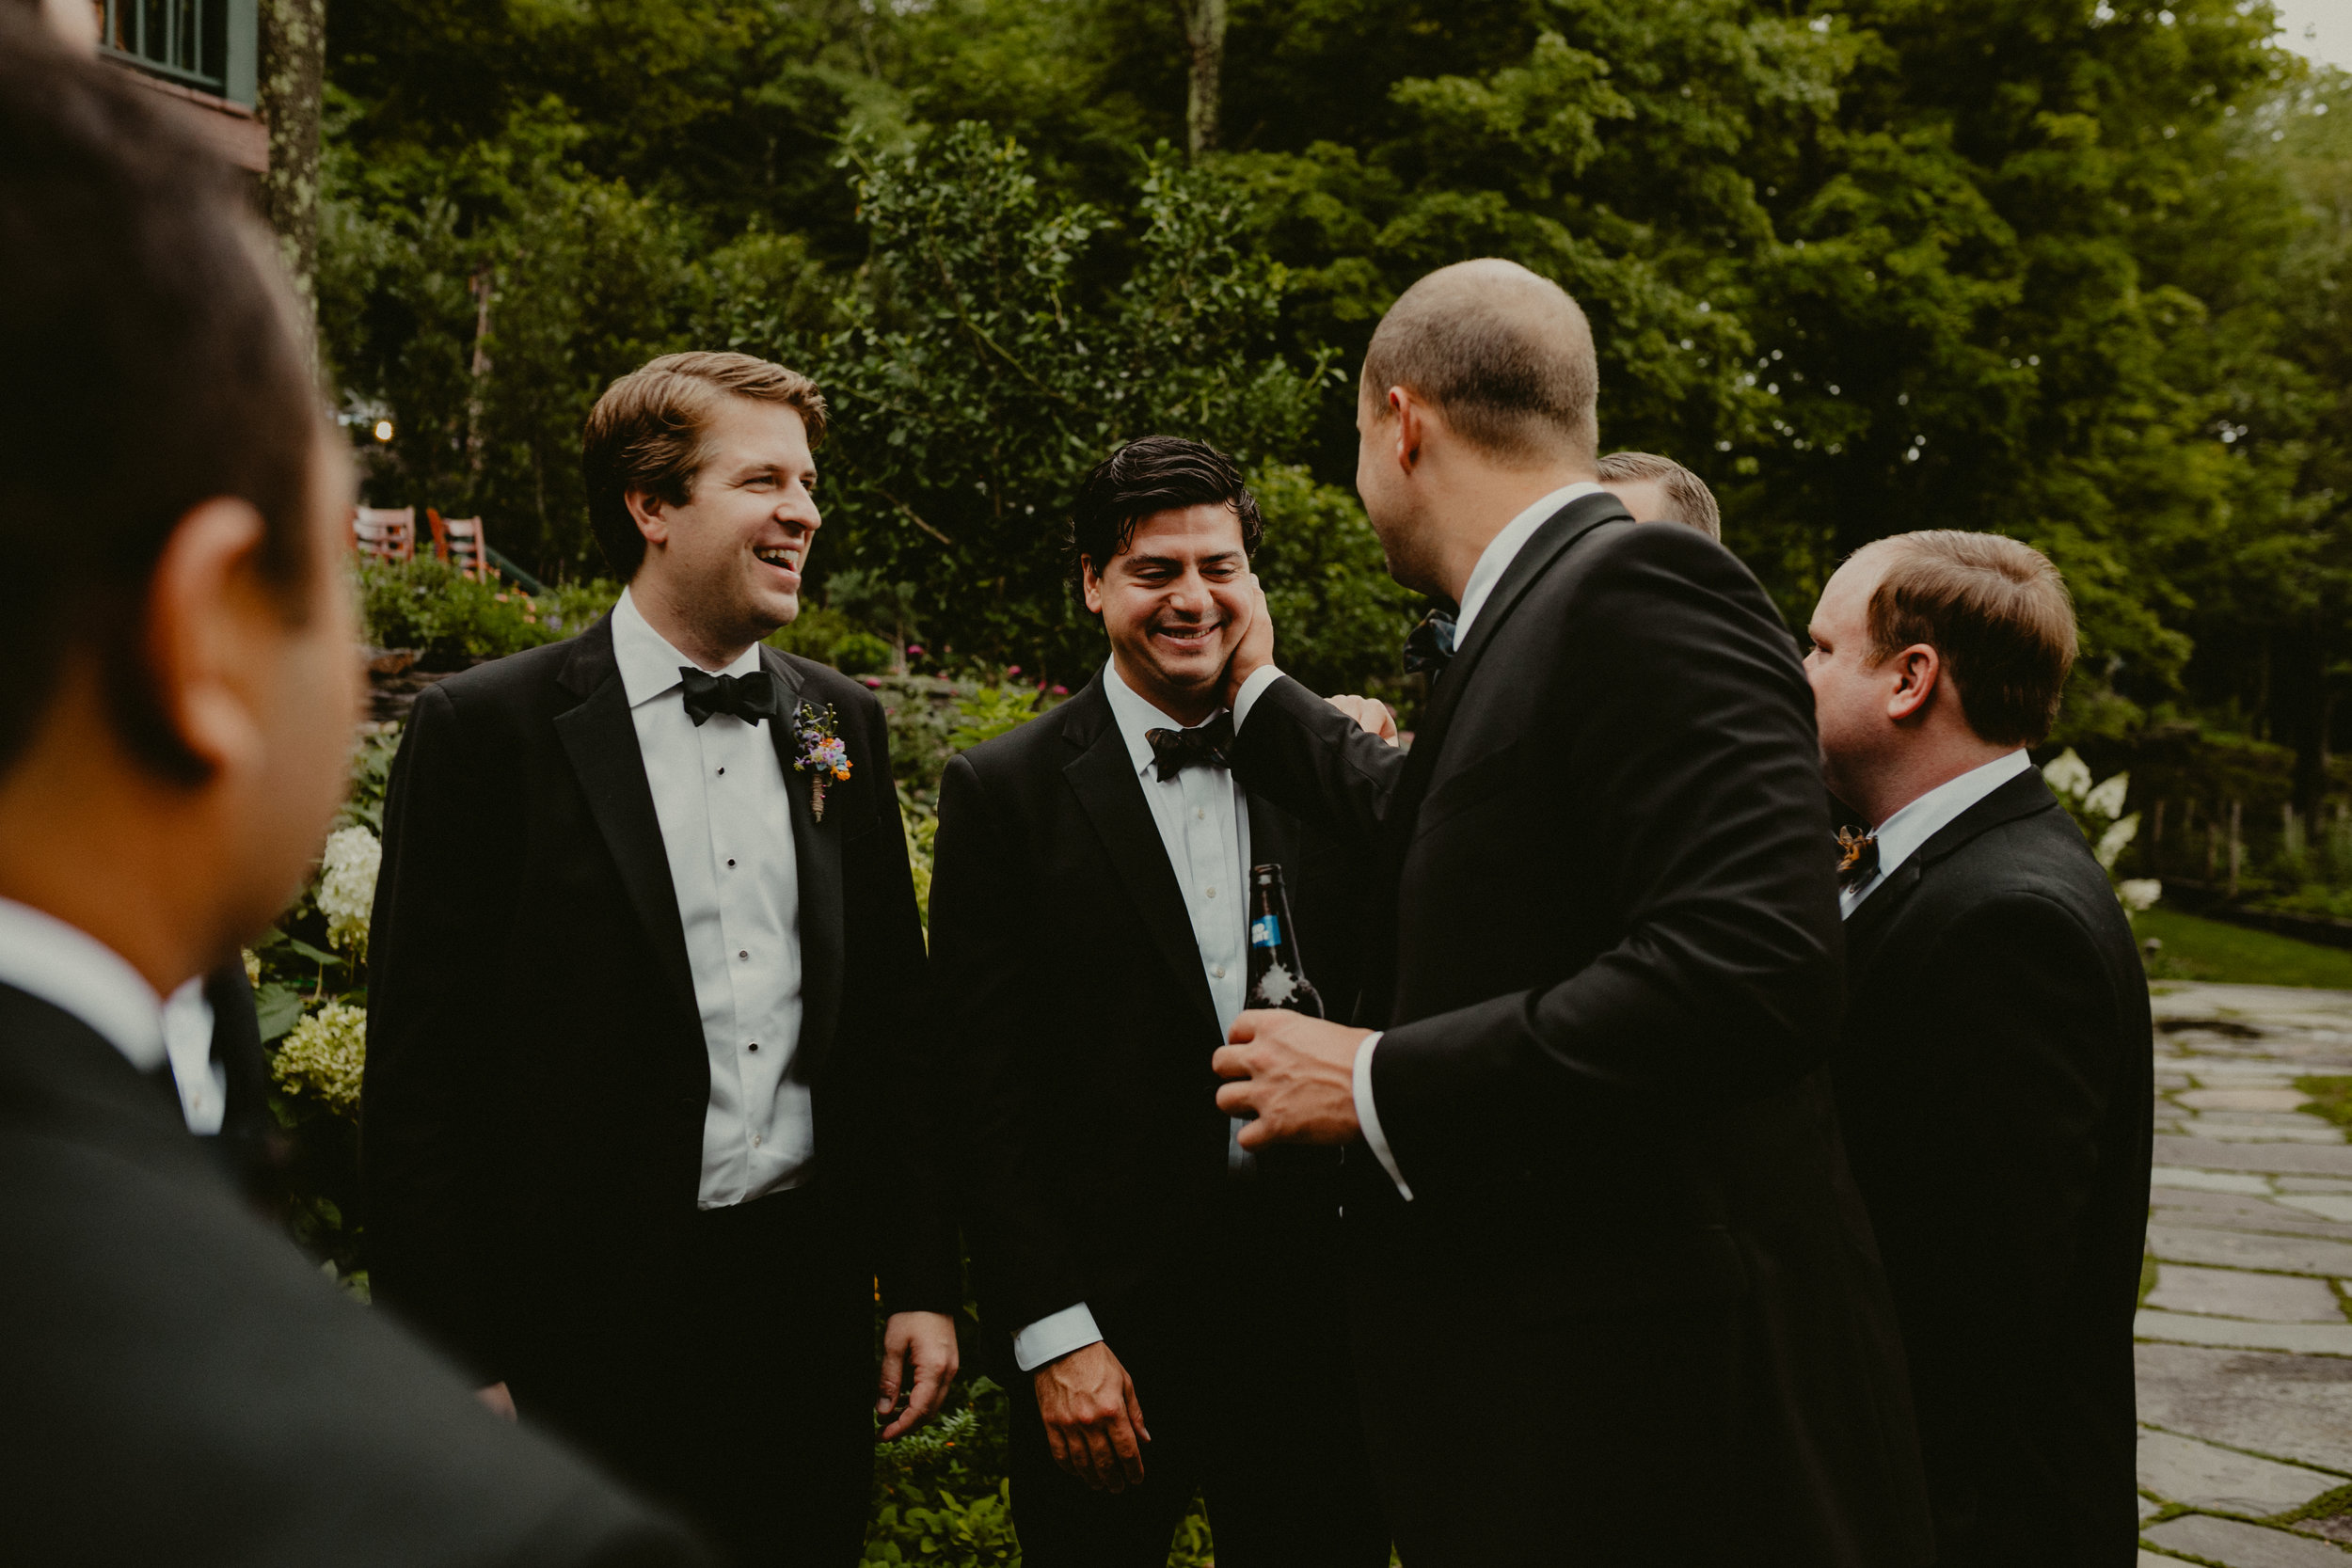 DEER_MOUNTAIN_INN_WEDDING_CHELLISE_MICHAEL_PHOTOGRAPHY-1231.jpg